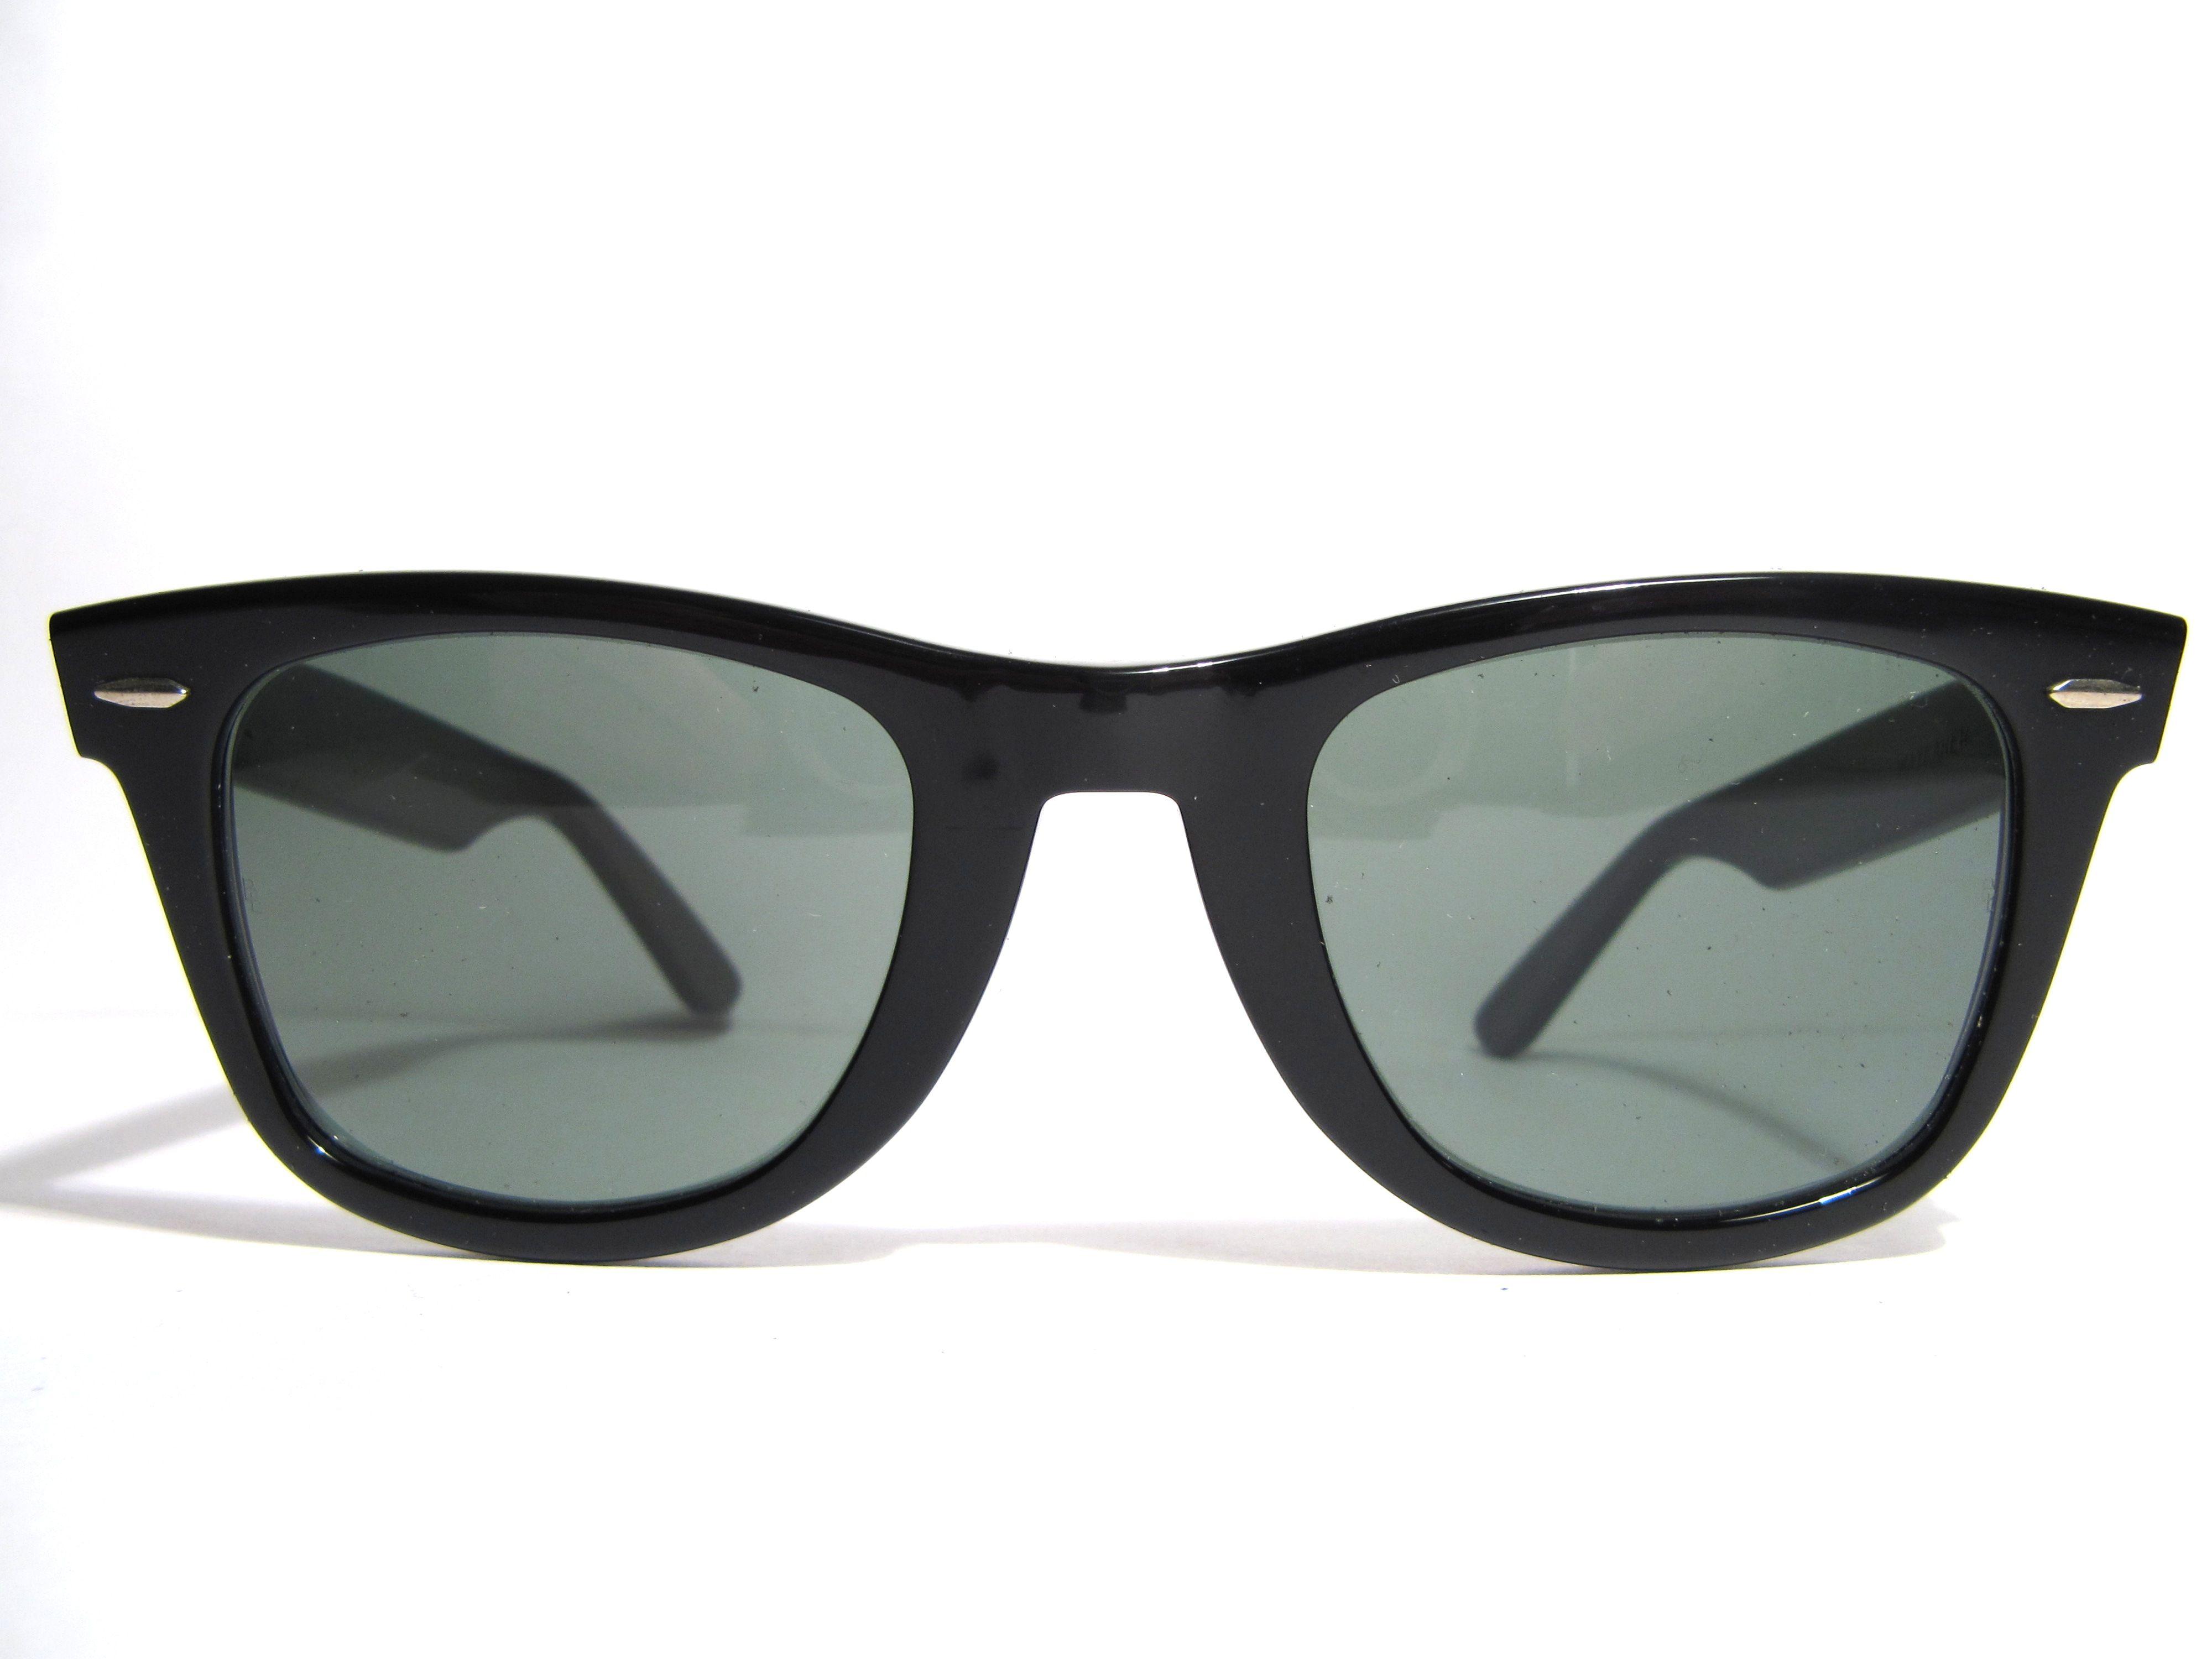 rb sunglasses | rb sunglasses | Pinterest